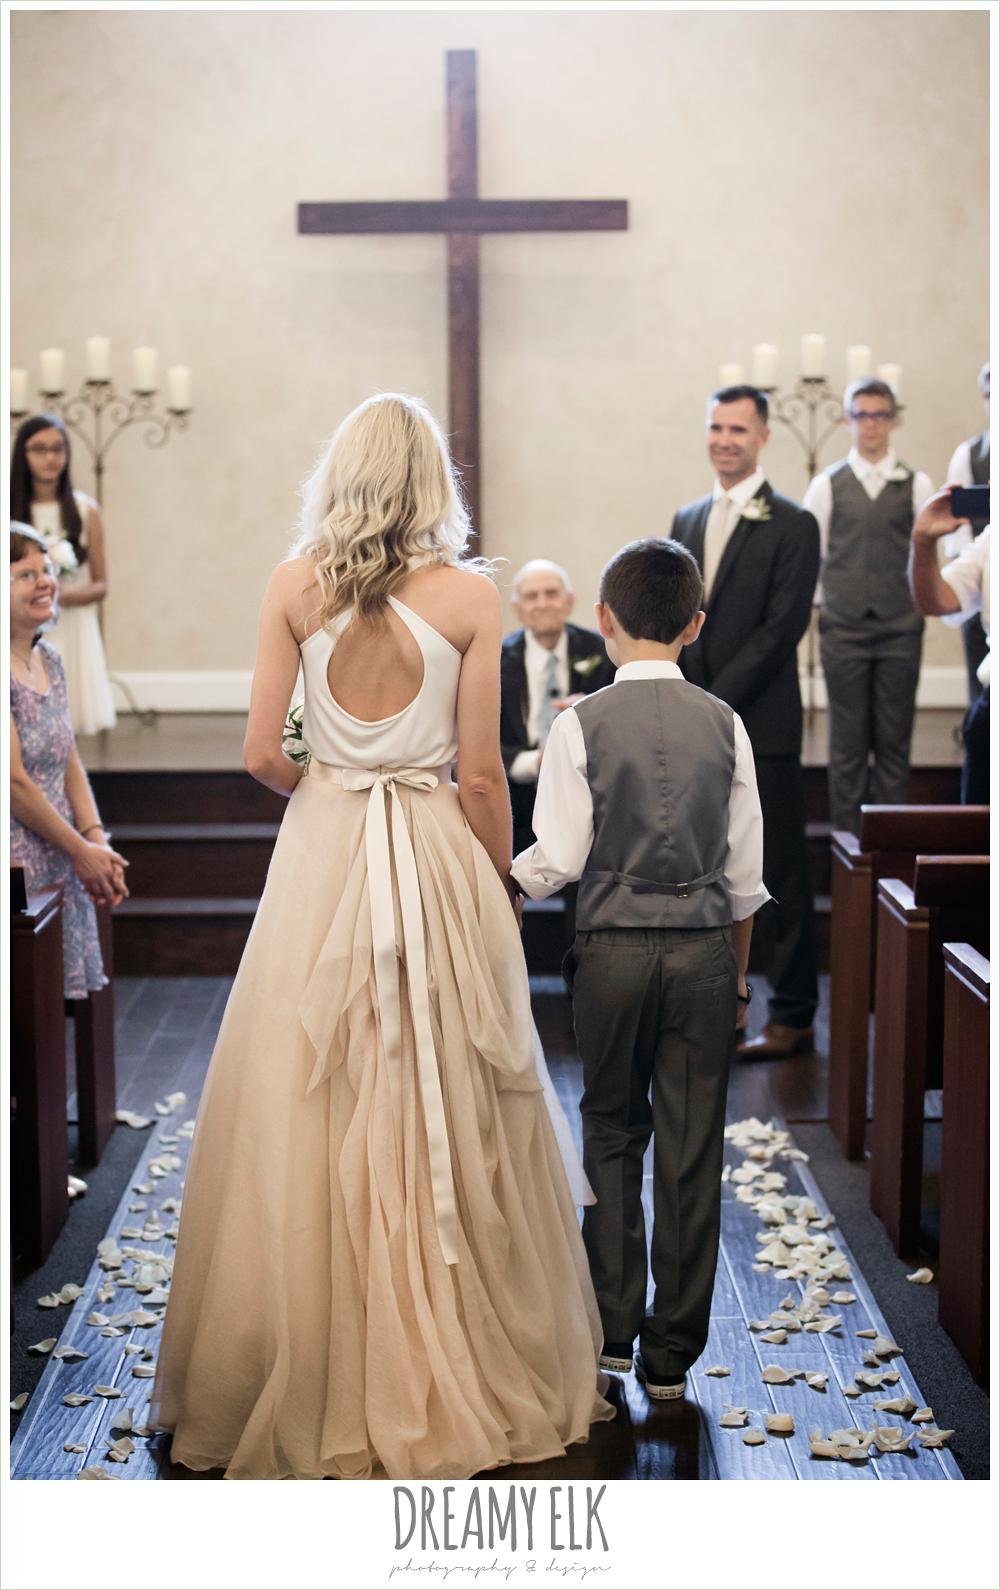 wedding ceremony, bride and son walking down the aisle, carol hannah kensington halter and blush skirt, july summer morning wedding, ashelynn manor, magnolia, texas {dreamy elk photography and design} photo